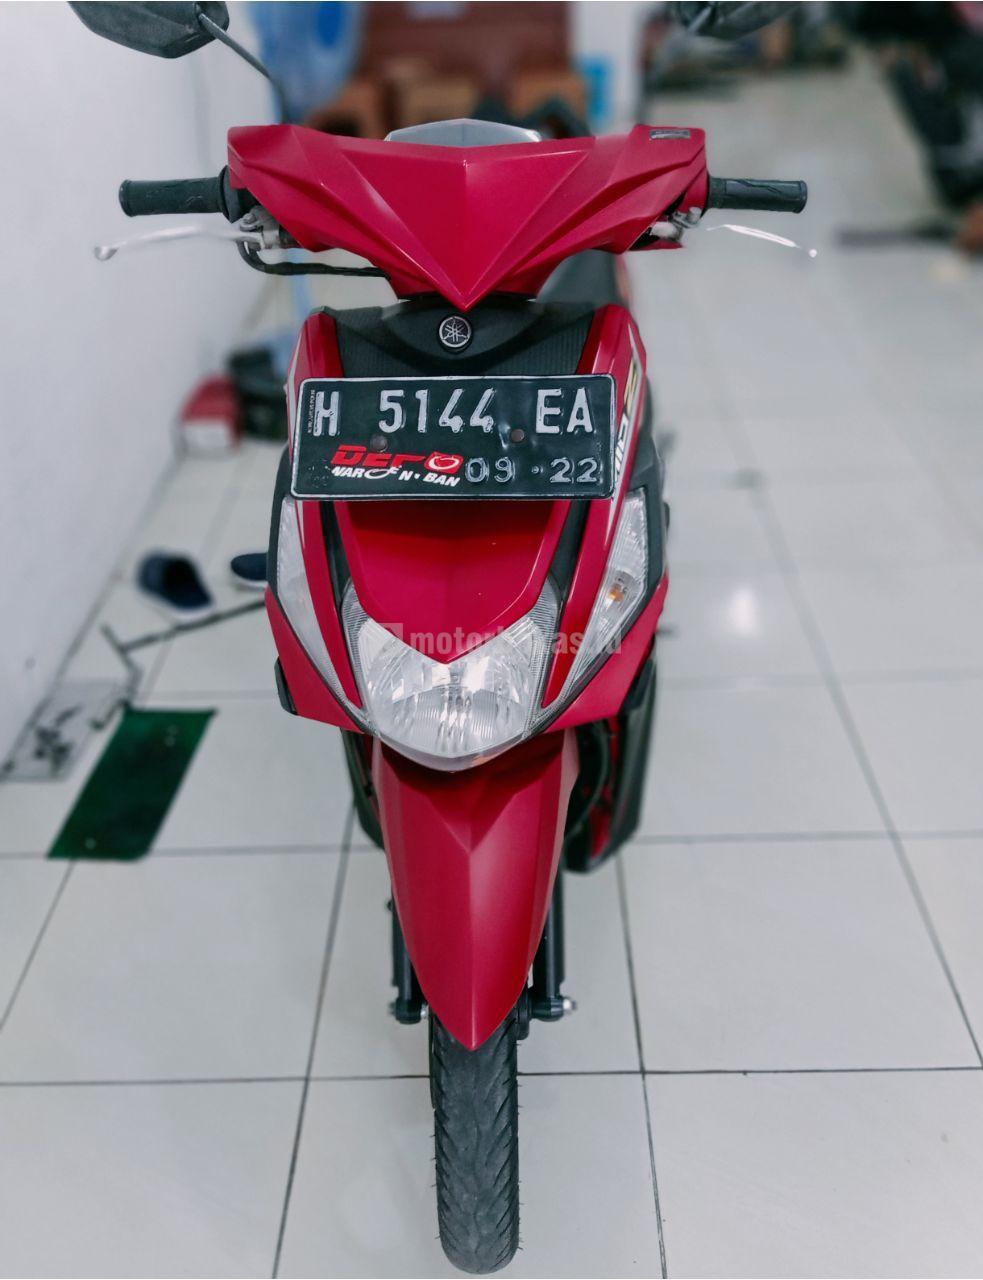 YAMAHA MIO Z FI 2015 motorbekas.id